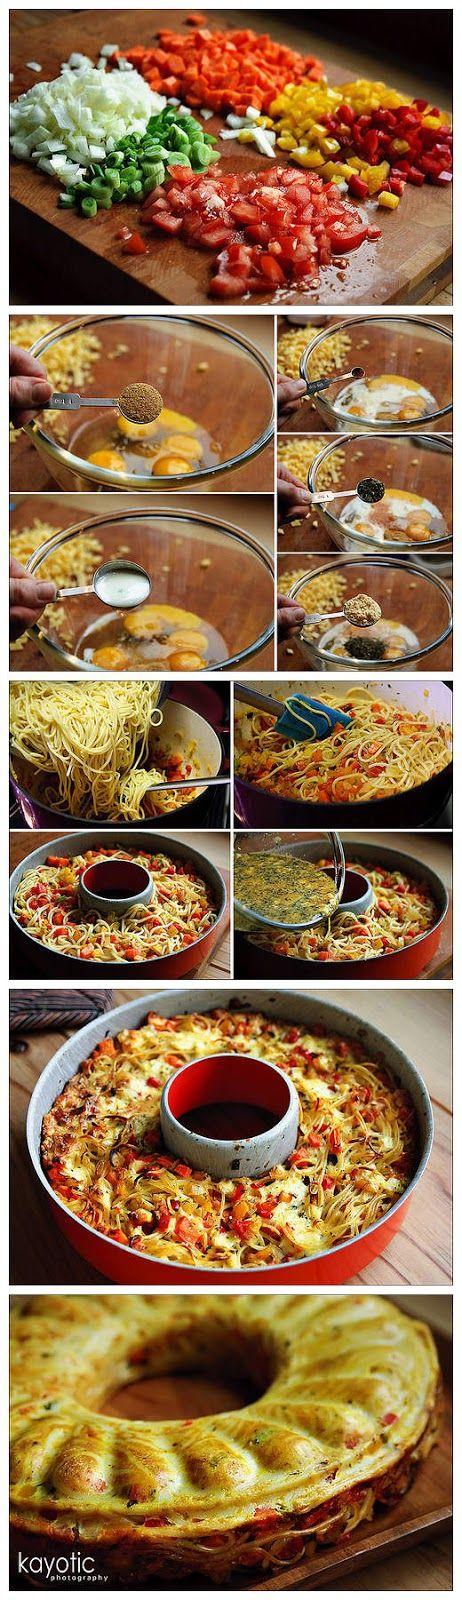 Spaghetti Pie - kiss recipe